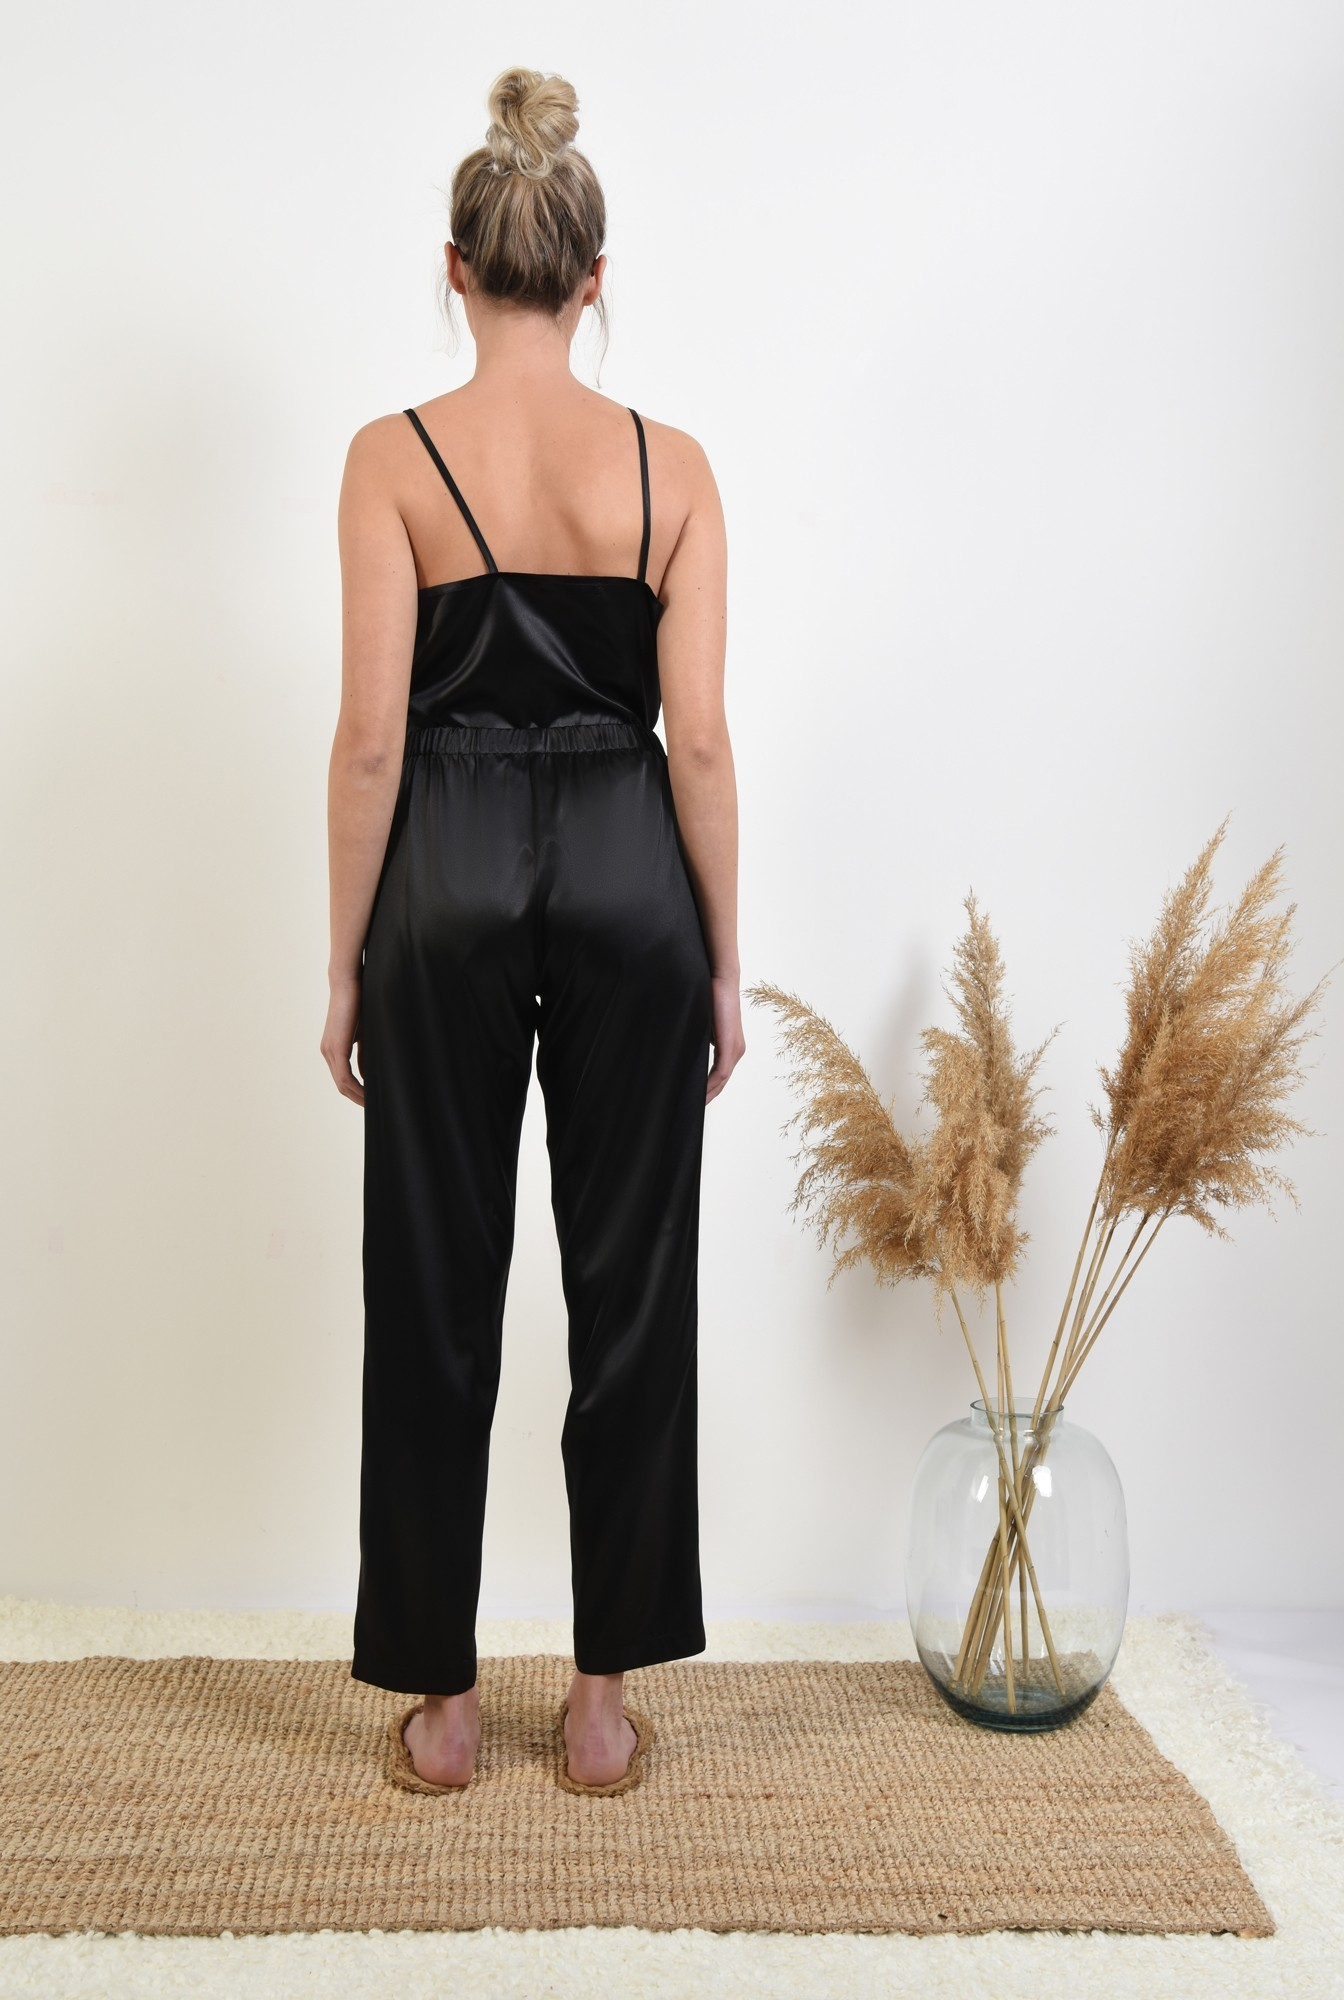 1 - 360 - pantaloni din satin, negri, lungi, cu funda in contrast